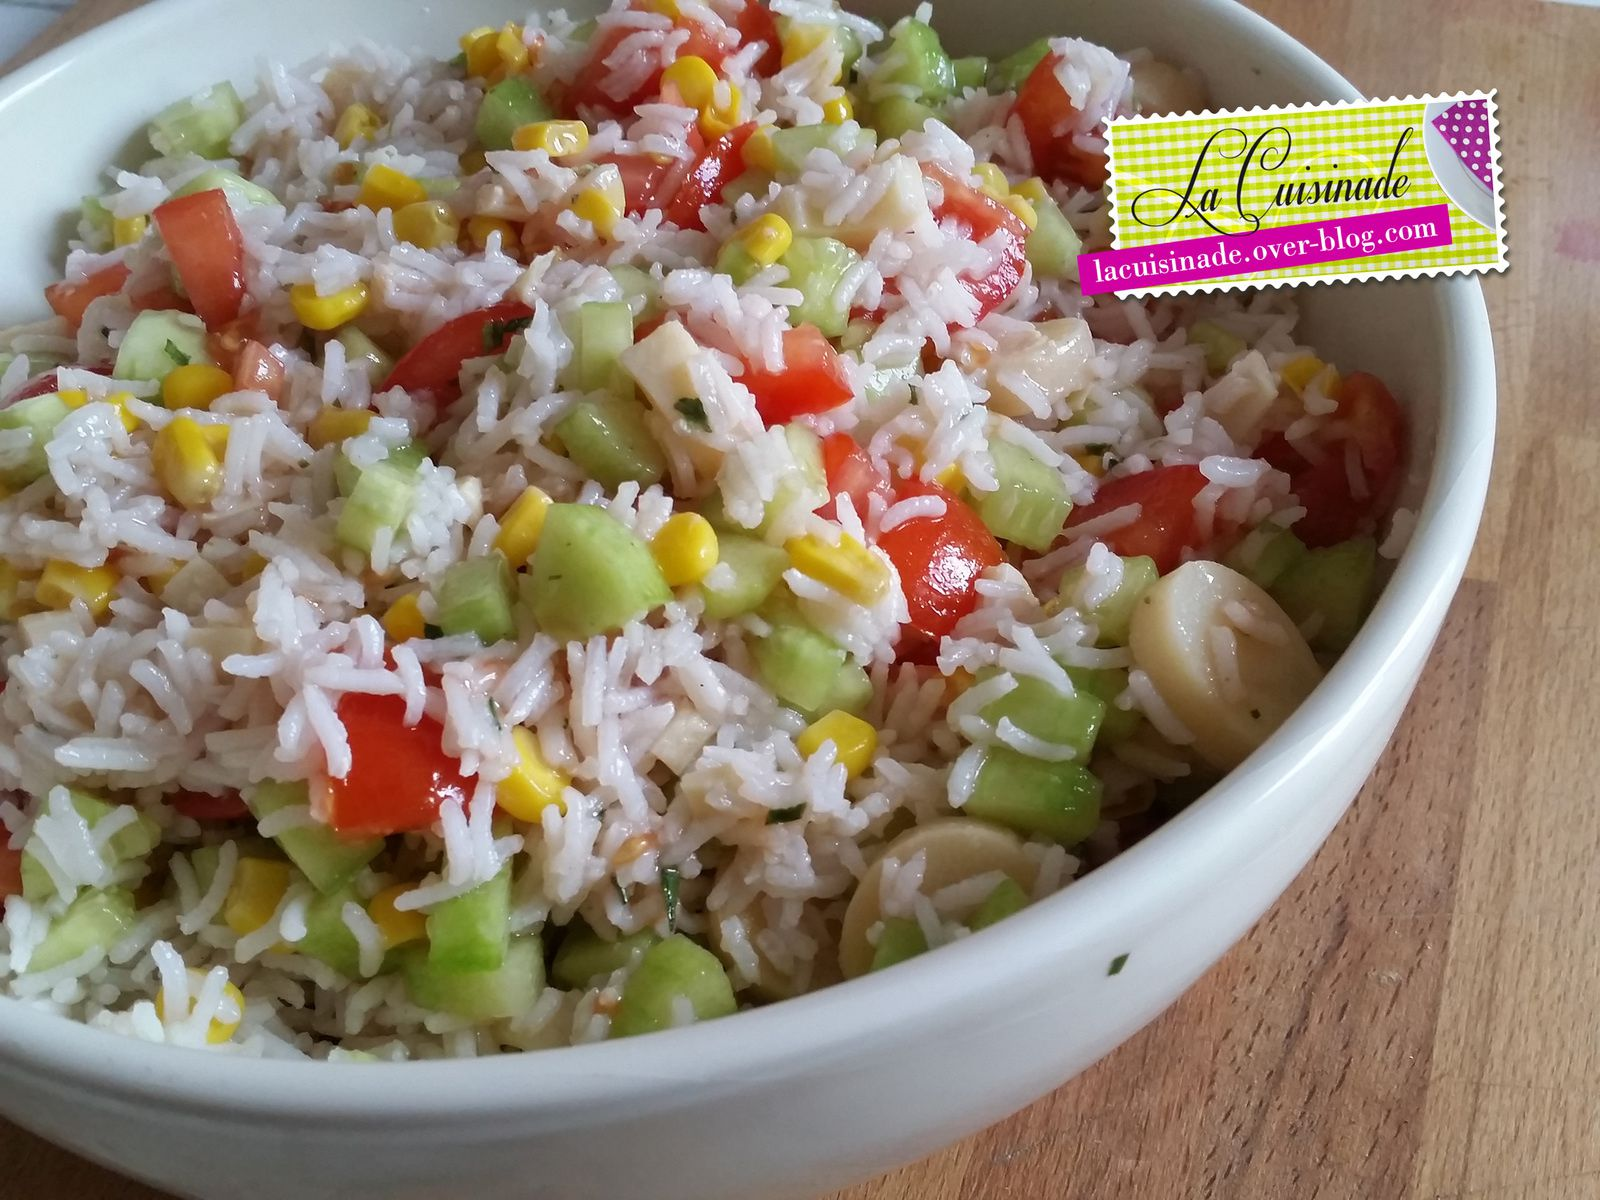 Salade de riz v g tarienne la cuisinade - Salade de riz pour 10 personnes ...